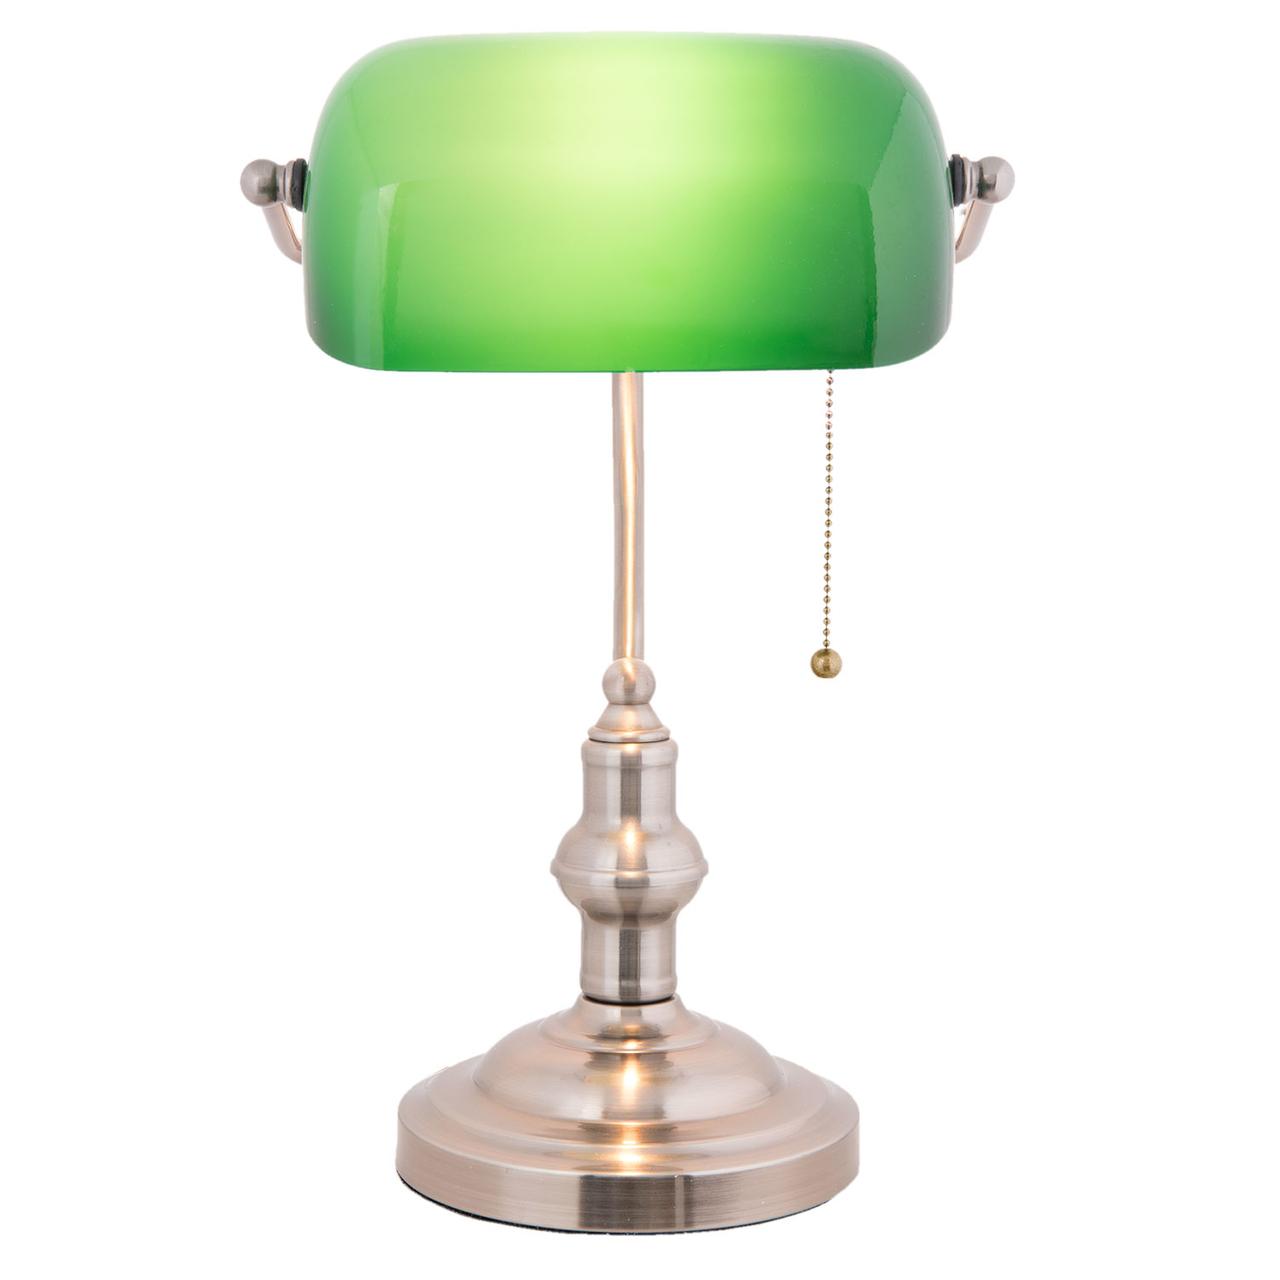 Clayre & Eef Schreibtisch-Lampe Komplet